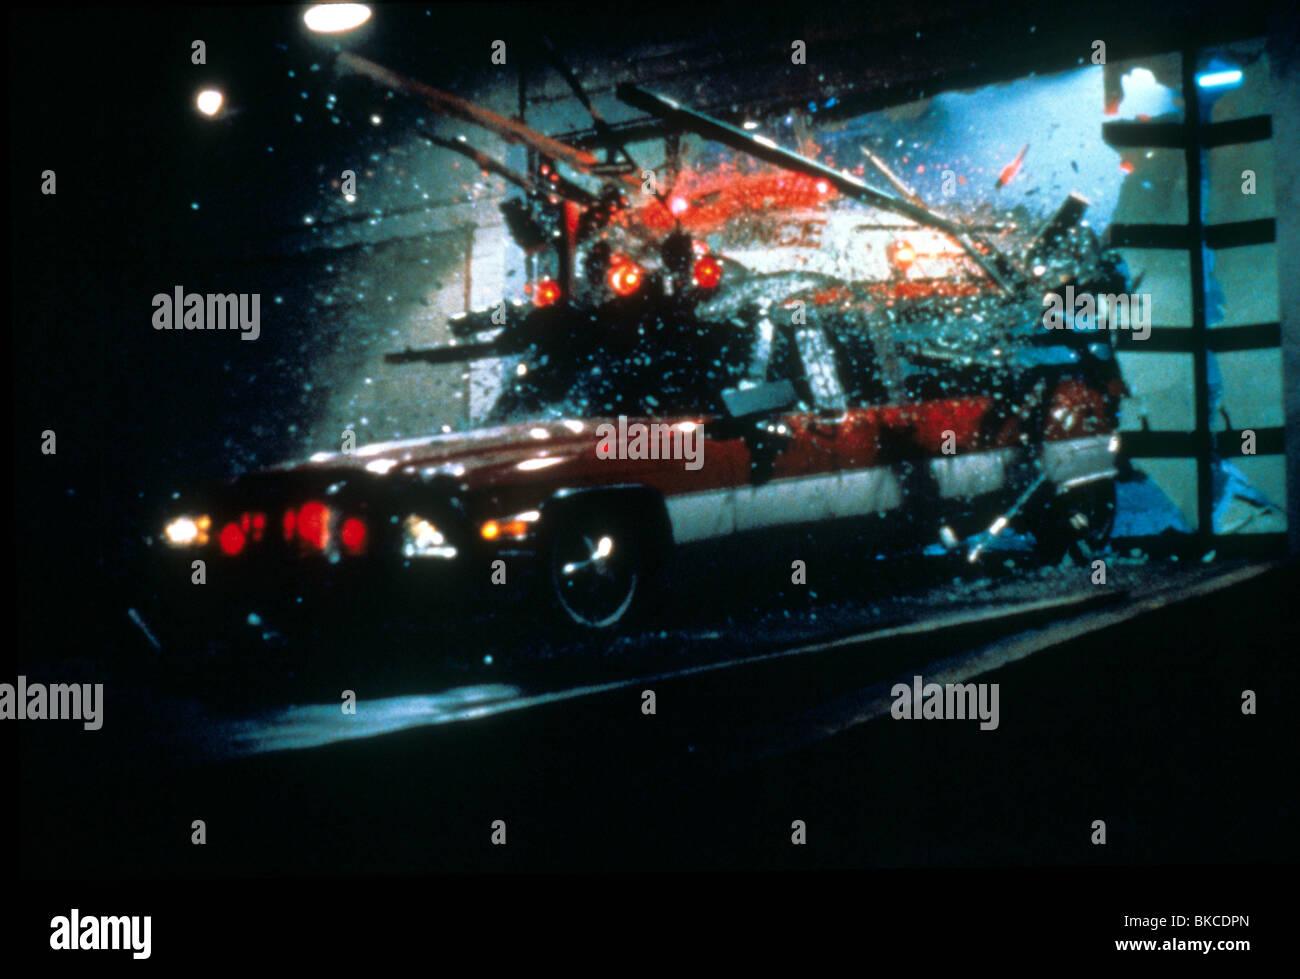 THE AMBULANCE -1990 - Stock Image